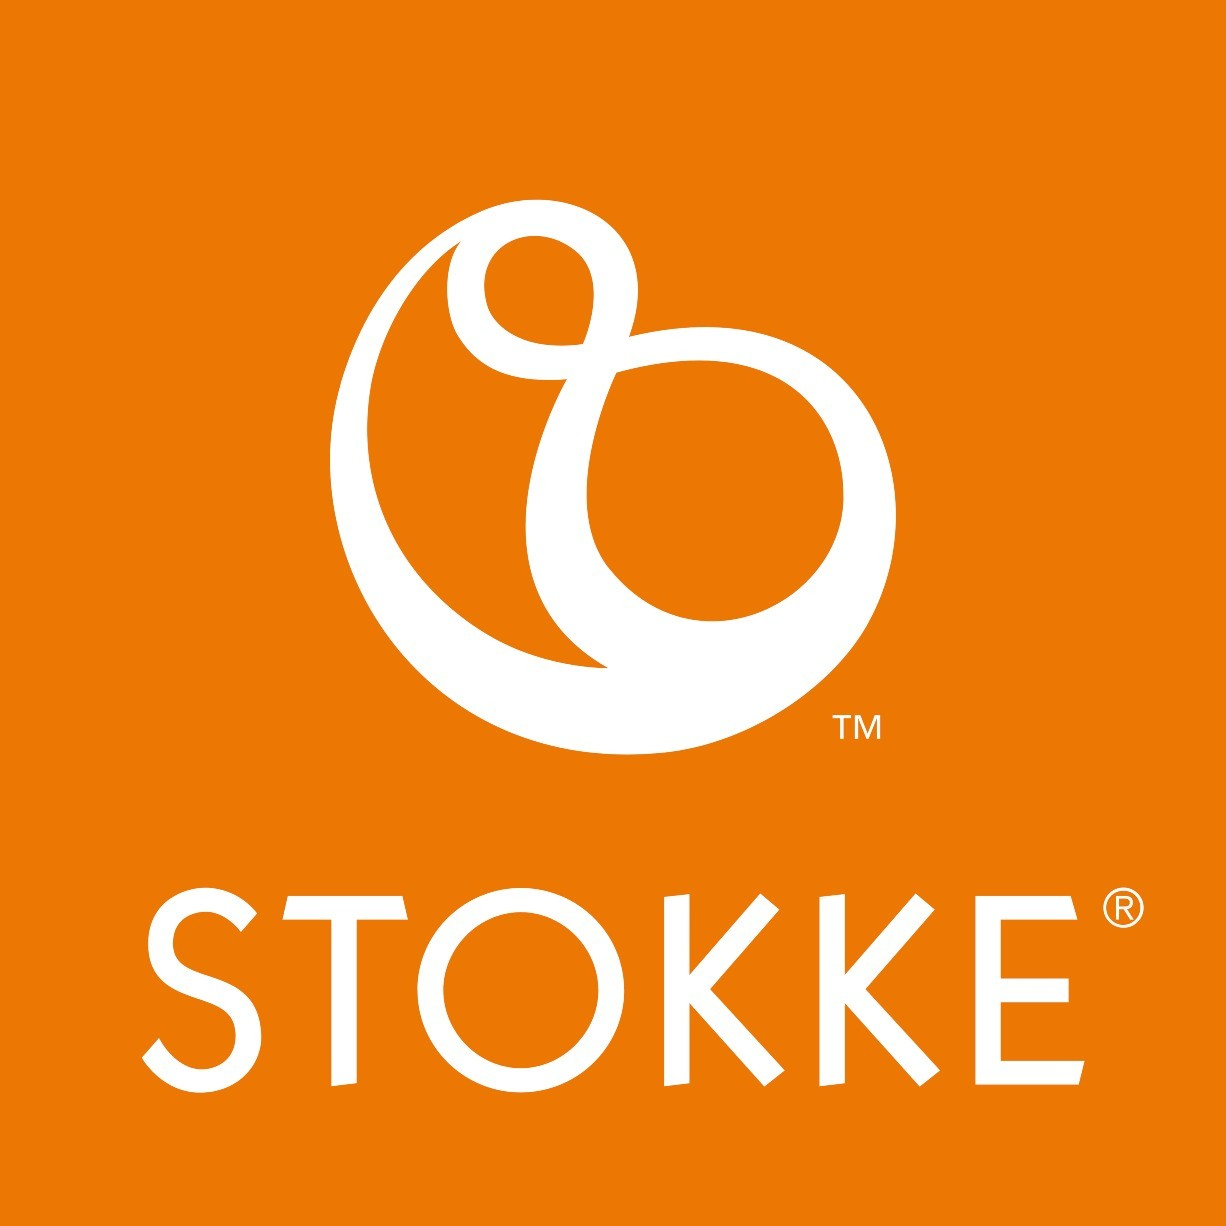 STOKKE